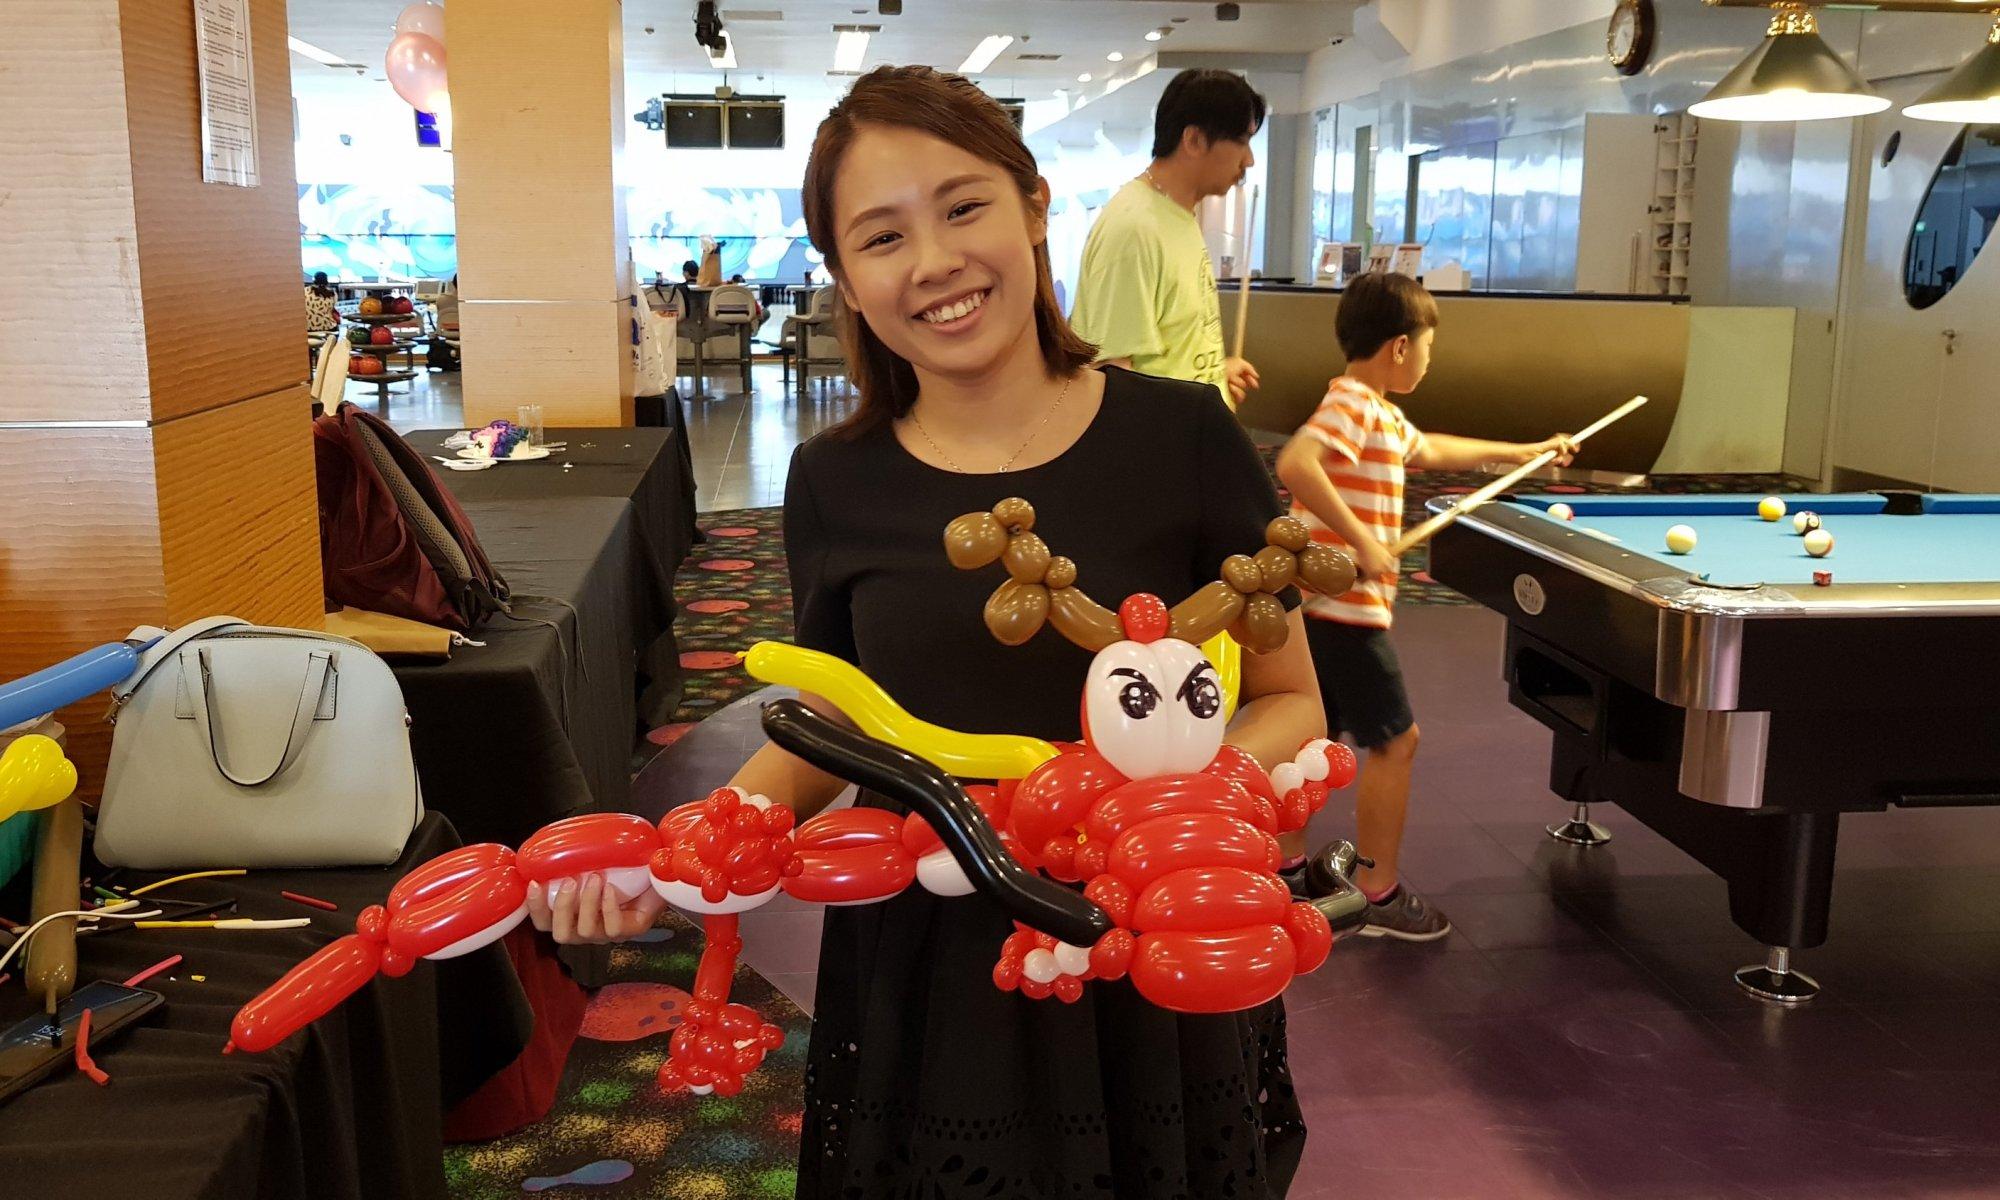 Chinese dragon balloon sculpture